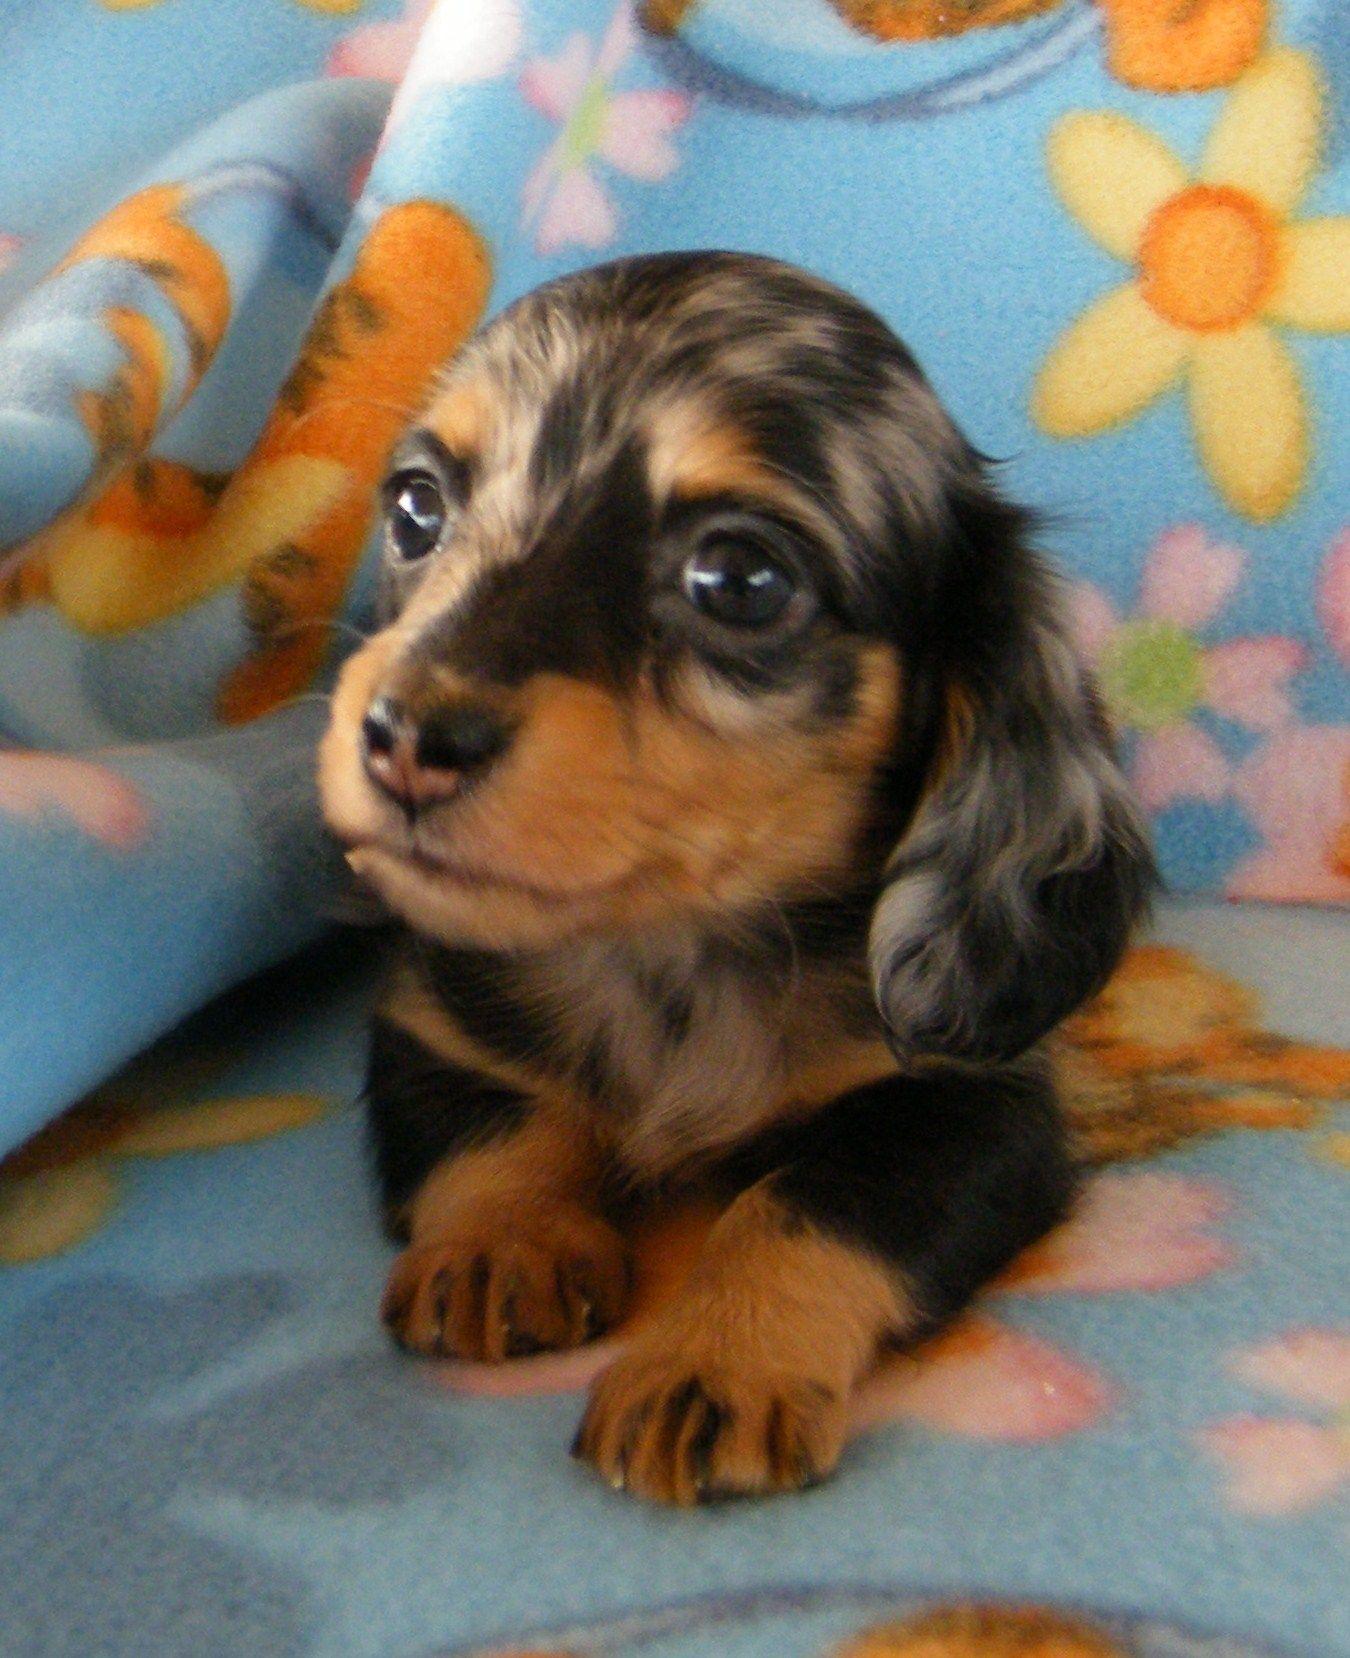 Teacup Weiner Leppold's Mini Dachshunds teacupdogslist